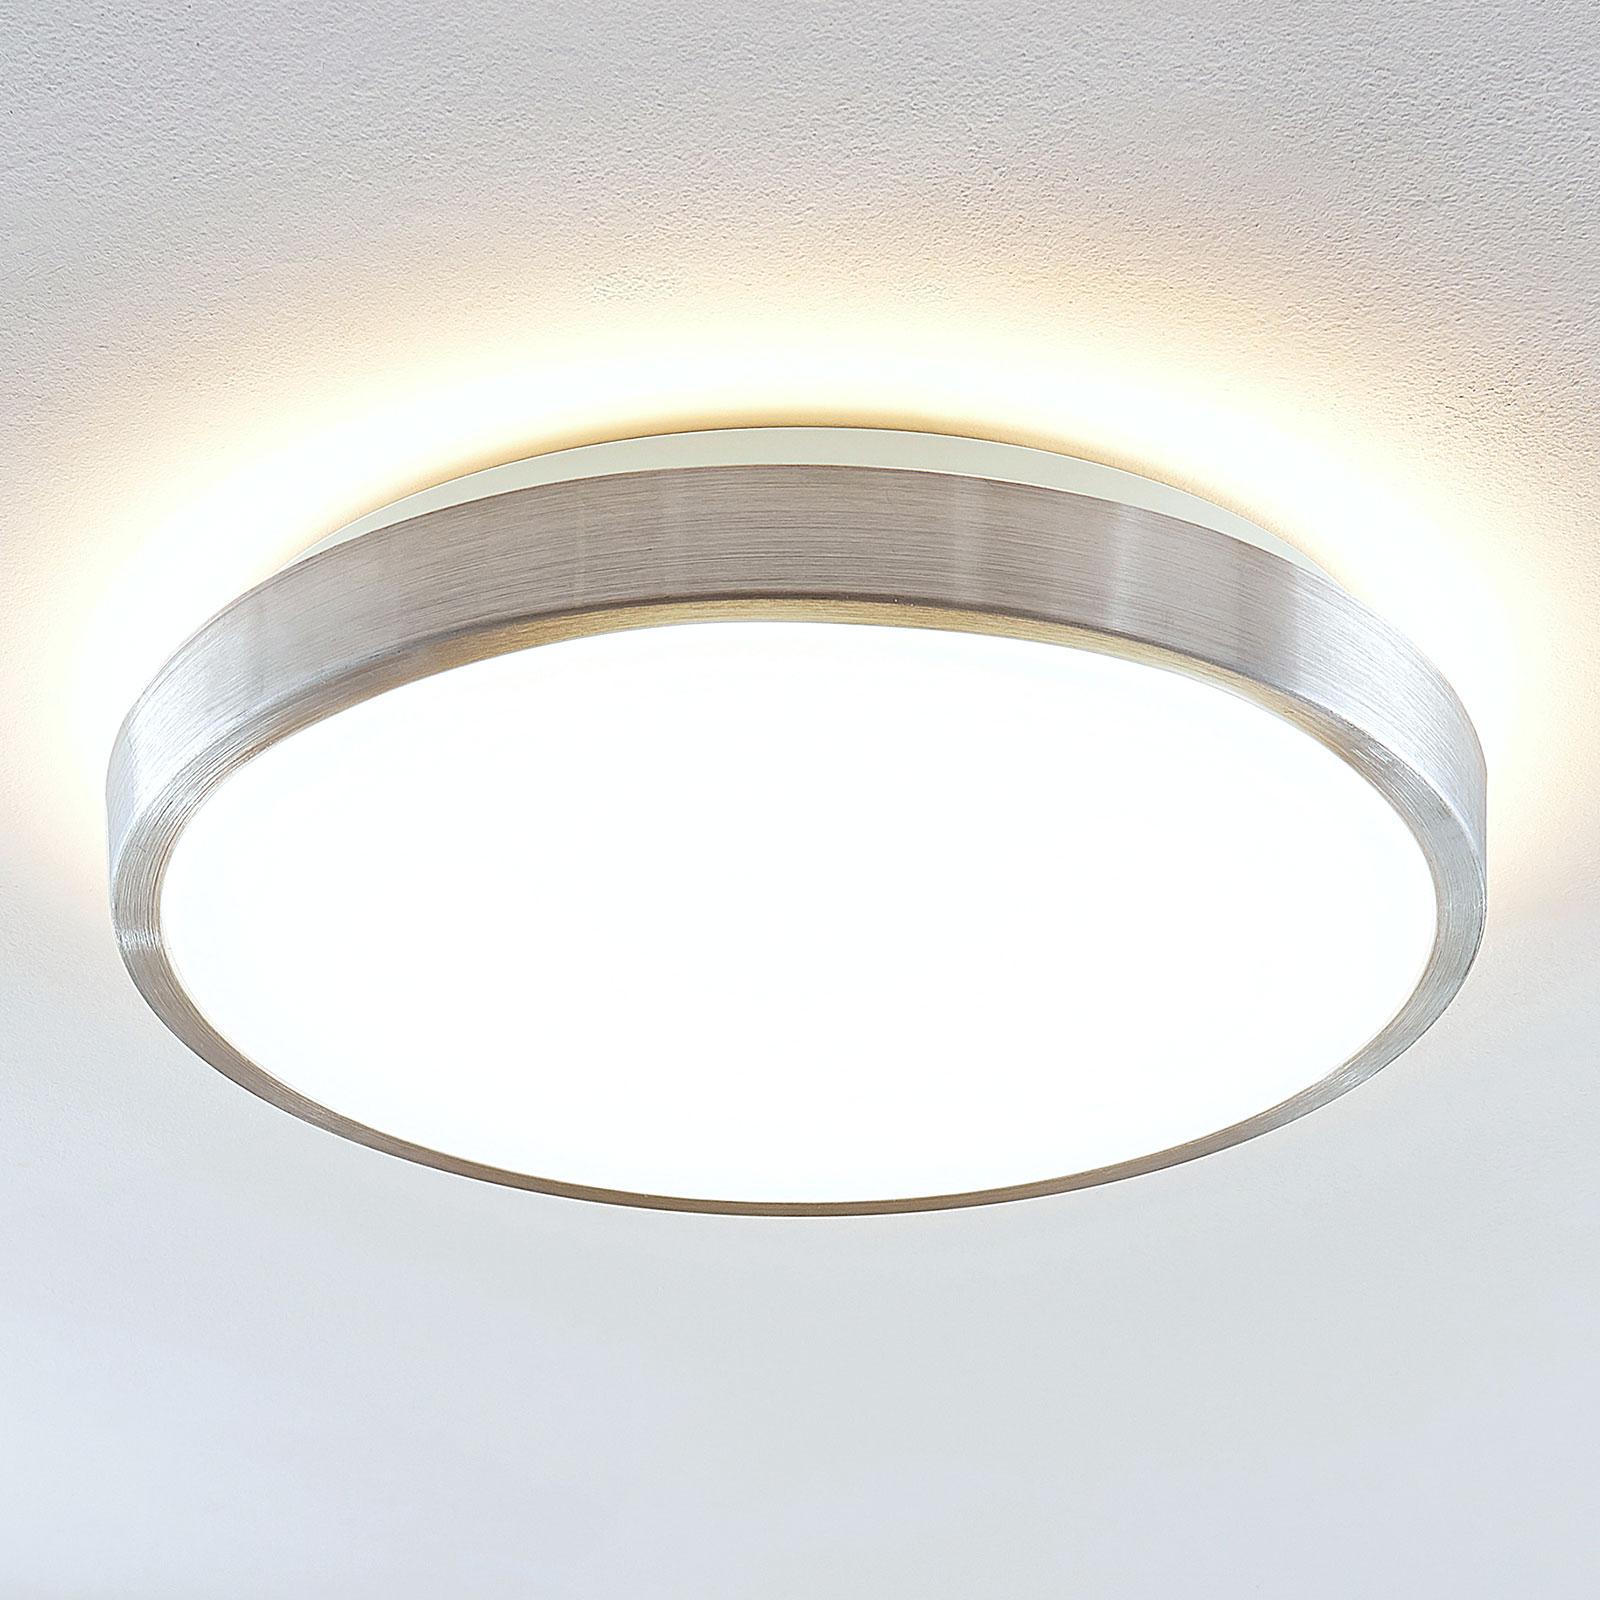 Lindby Emelie LED ceiling lamp, round, 42cm_9624959_1